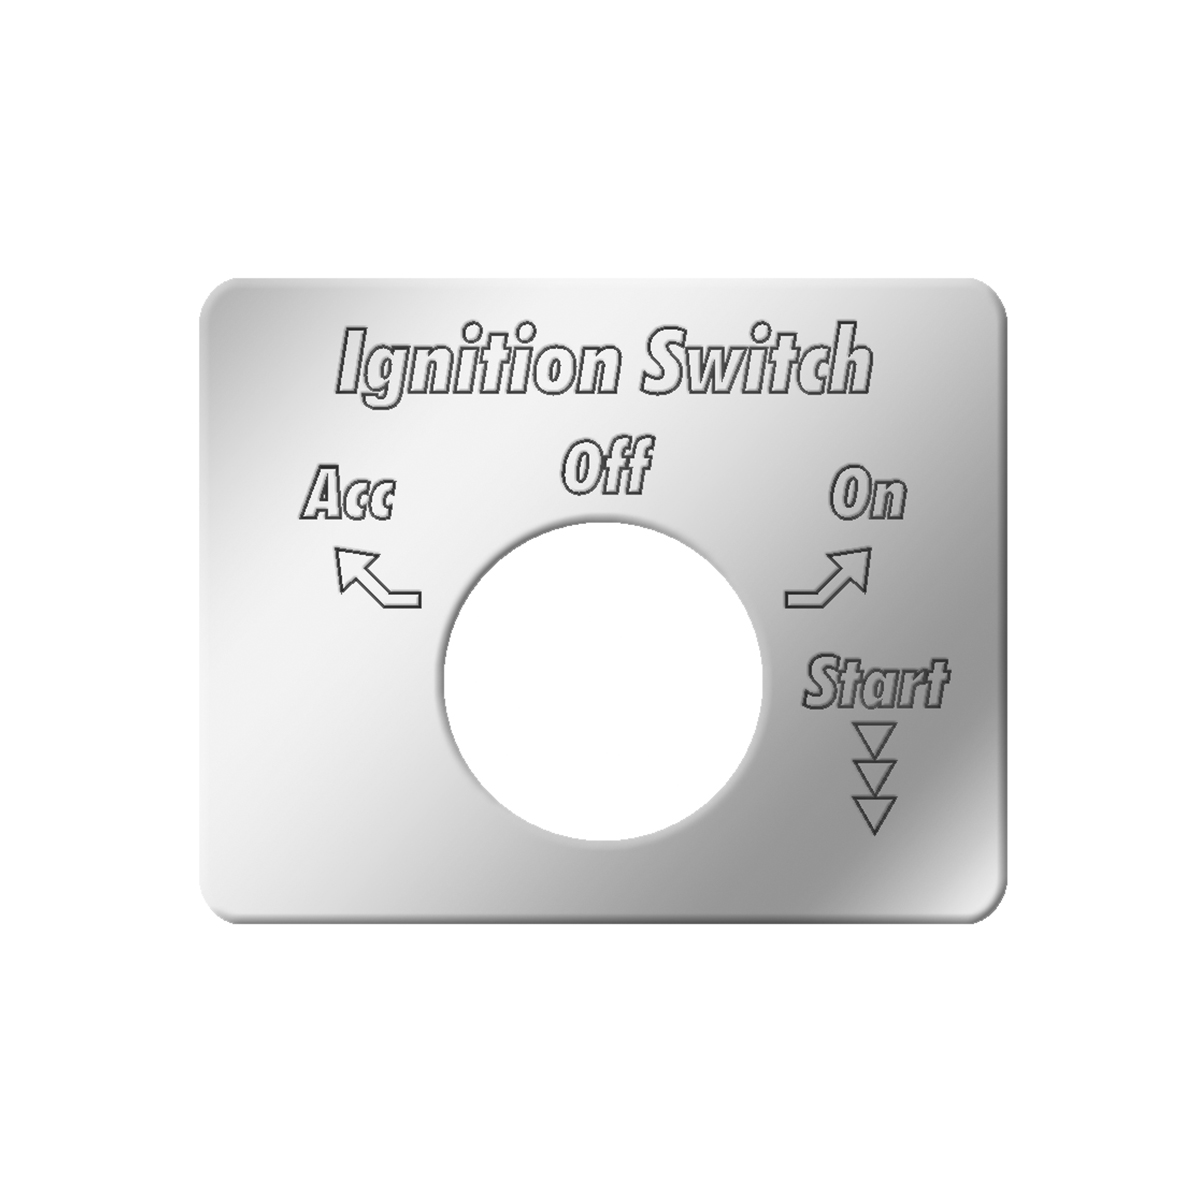 #68624 - Ignition Key